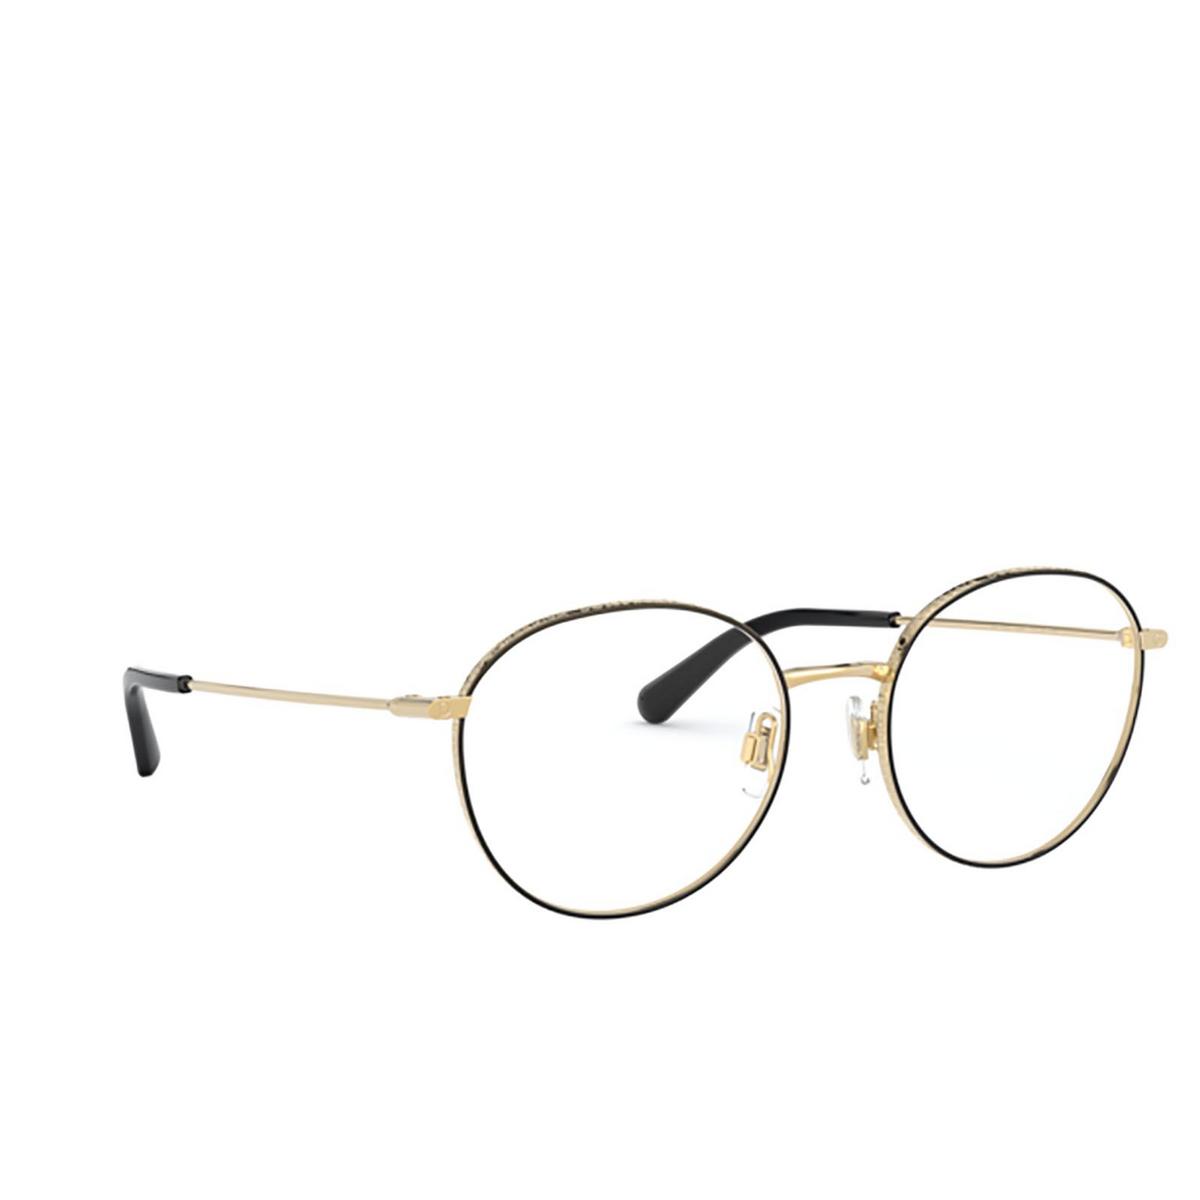 Dolce & Gabbana® Round Eyeglasses: DG1322 color Gold / Black 1334 - three-quarters view.